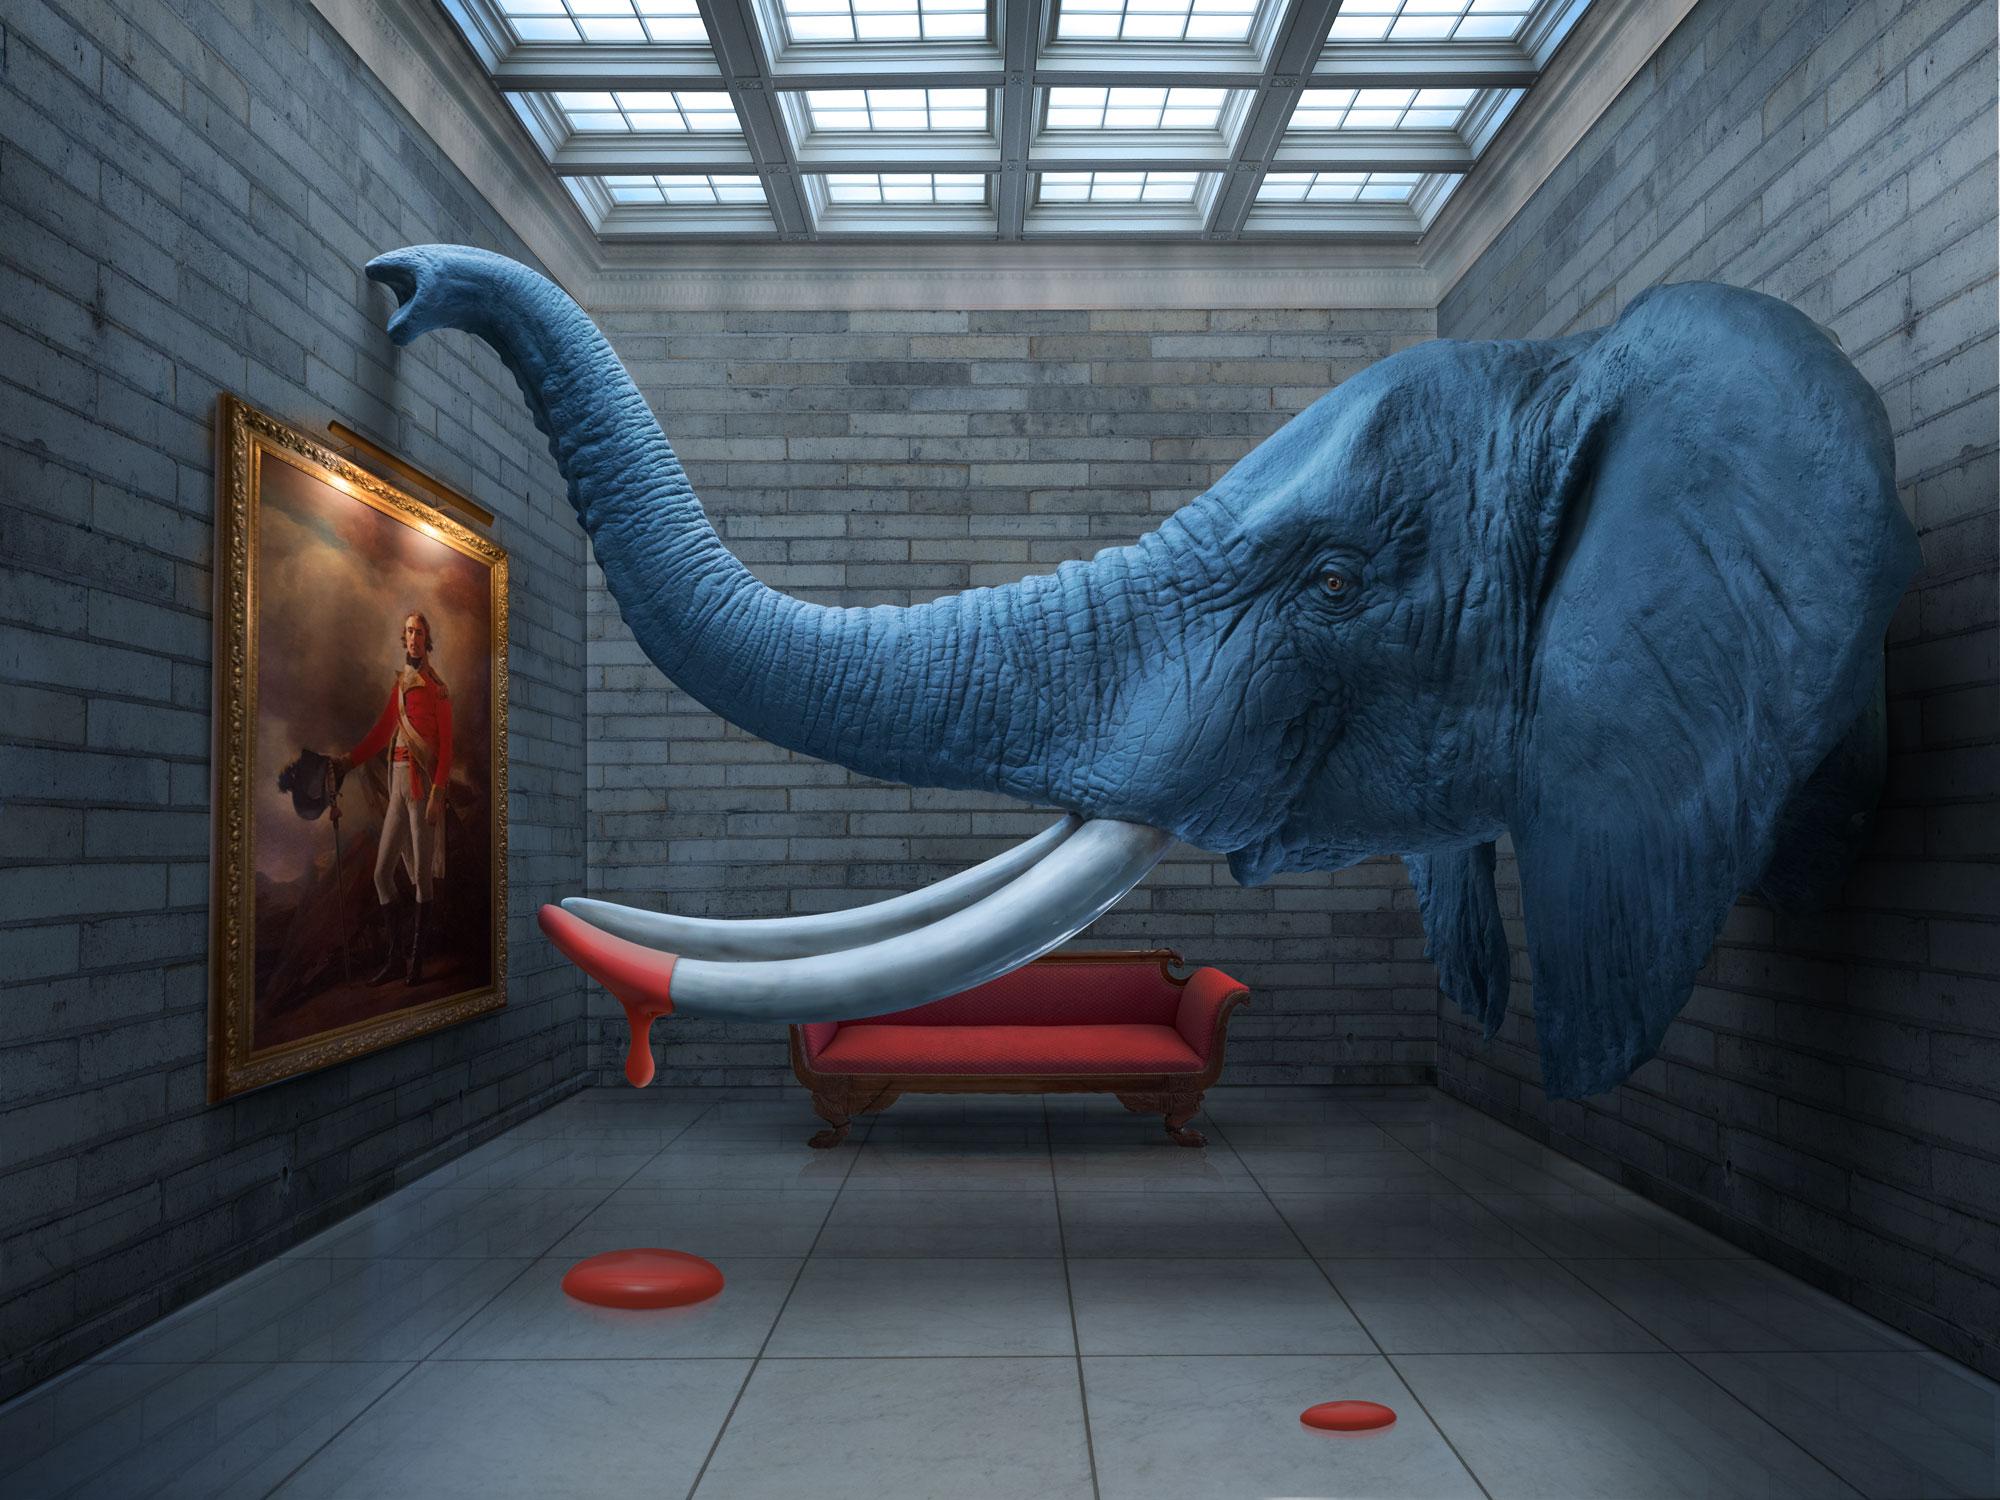 Elephant_BoxProject_DiCola_web.jpg